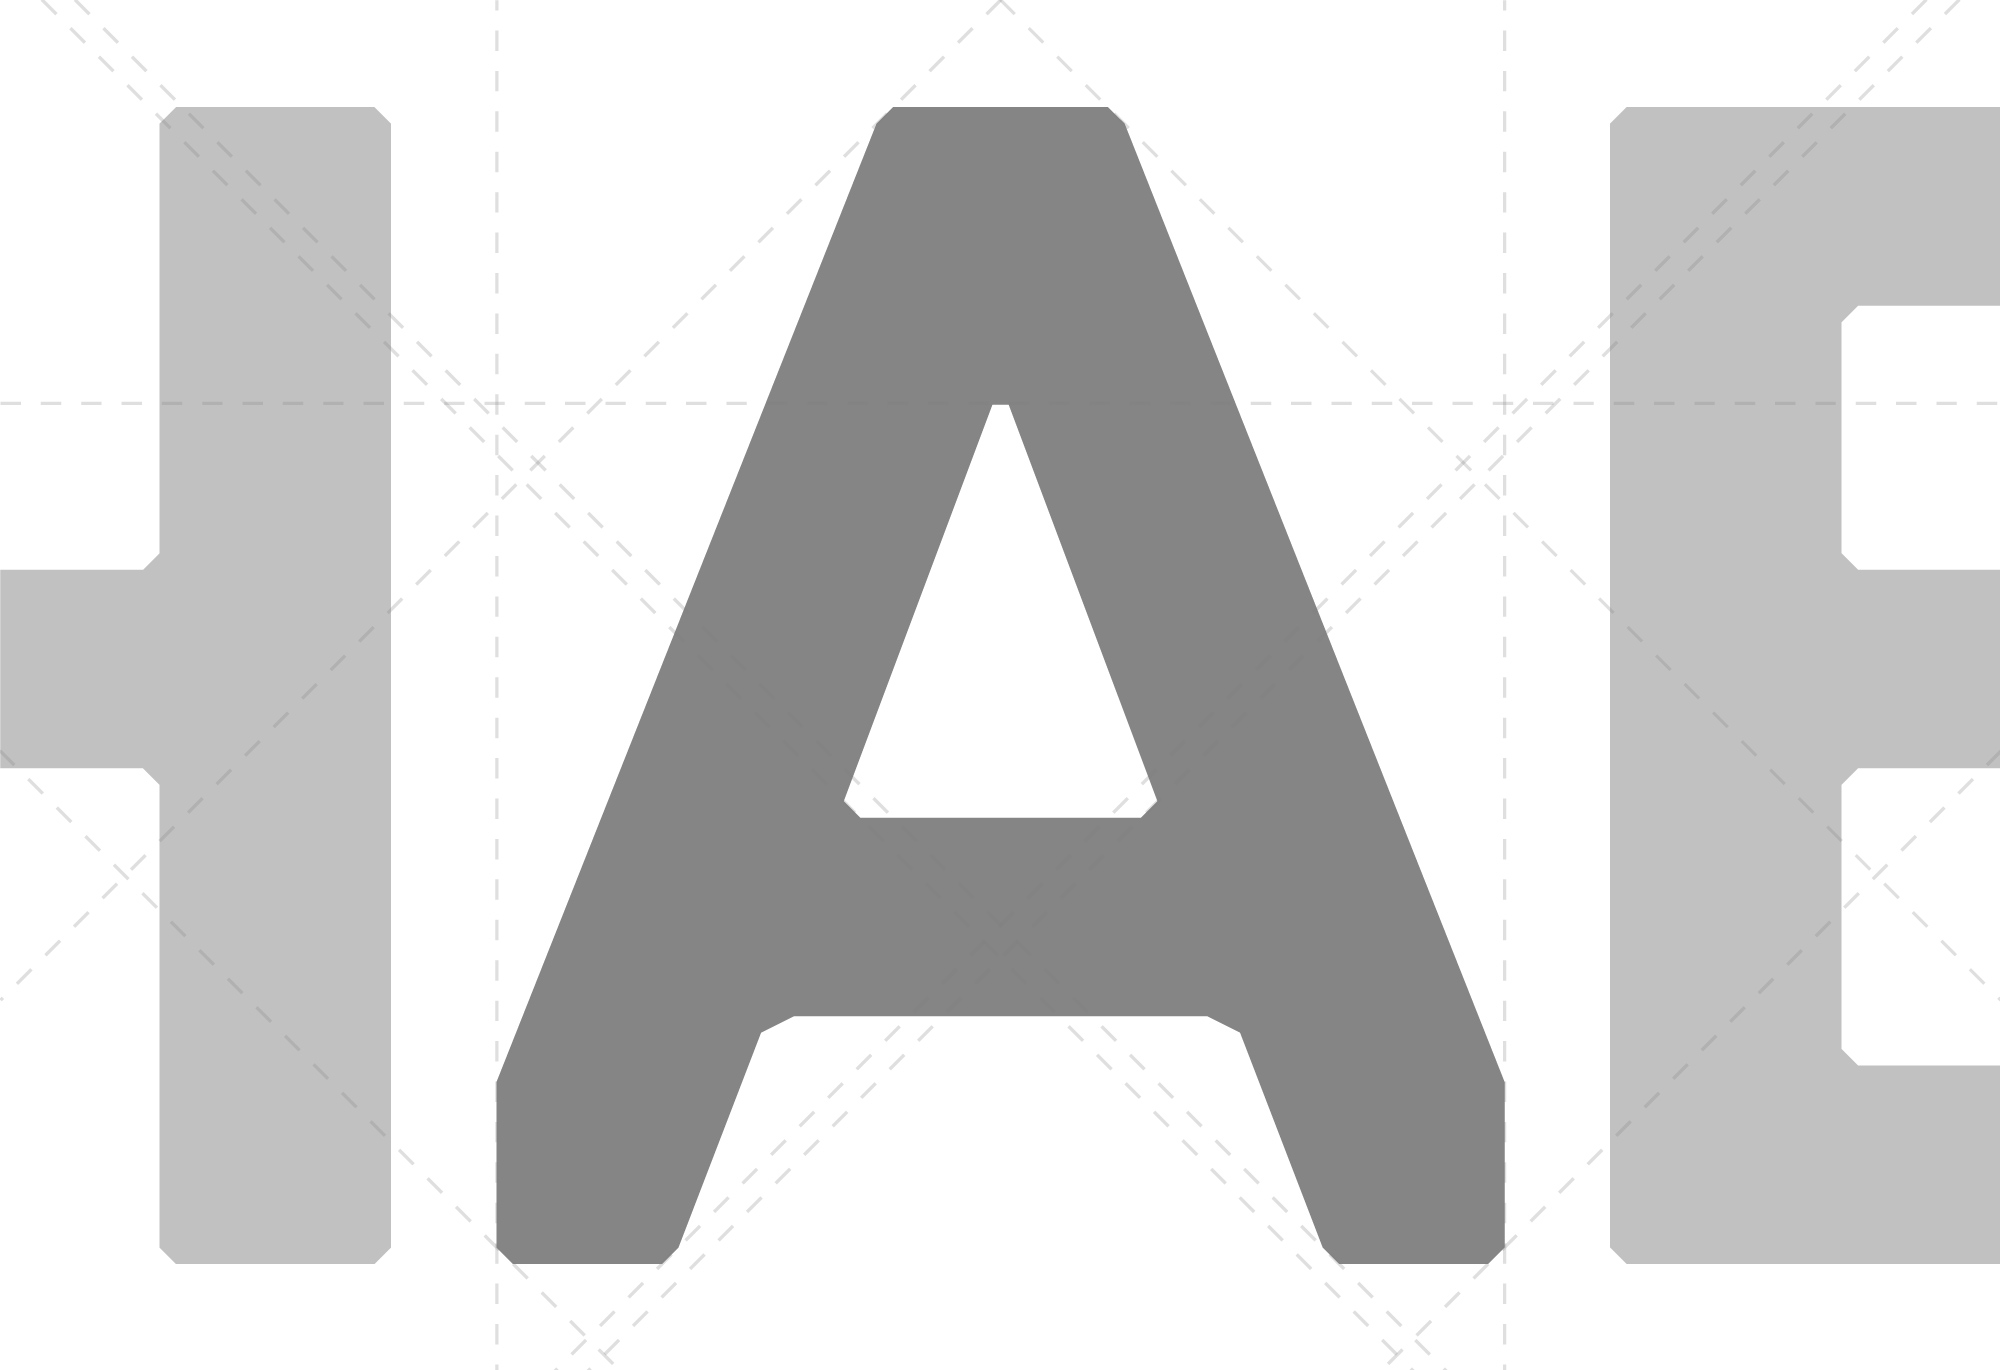 Colm O'Connor Studio, Colm O Connor, Colm O'Connor, Colm O Connor graphic design, Colm O'Connor graphic design, Colm O Connor graphic designer, Colm O'Connor graphic designer, Colm O' Connor Wexford, Colm O Connor Wexford, colmoconnor, Colm O Connor Freelance graphic designer living in Wexford Ireland, Colm O'Connor Freelance graphic designer living in Wexford Ireland, Colm O Connor Graphic Design and Branding Studio Based in Wexford Ireland, Colm O'Connor Graphic Design and Branding Studio Based in Wexford Ireland, Colm O Connor graphic design wexford, Colm O'Connor graphic design wexford, Colm O'Connor graphic design Ireland, Colm O Connor graphic design Ireland, Colm O Connor Studio, Colm O'Connor Studio, Colm O Connor design studio, Colm O'Connor design studio, Colm O Connor design studio wexford, Colm O'Connor design studio Wexford, Colm O Connor design studio Ireland, Colm O'Connor design studio Ireland, Colm O Connor graphic design studio, Colm O'Connor Graphic design studio, Colm O Connor graphic design studio wexford, Colm O'Connor graphic design studio wexford, design studio wexford, design studio ireland, graphic designer, graphic design, freelance graphic design, freelance graphic designer, freelance graphic design wexford, freelance graphic designer wexford, web design, web designer, website design, website designer, graphic design waterford, graphic designer waterford, graphic design cork, graphic designer cork, graphic design dublin, graphic designer dublin, graphic designer Ireland, illustrator, graphic design portfolio, brand identity, print, logo, logotype, logo mark, visual identity, branding, business card, logo design, logo designer, logo designer wexford, logo designer waterford, logo designer cork, logo designer dublin, brand designer, brand designer wexford, brand designer dublin, brand designer waterford, brand designer cork, typography, graphic design and branding studio based in wexford, graphic design studio based in wexford, design agenc